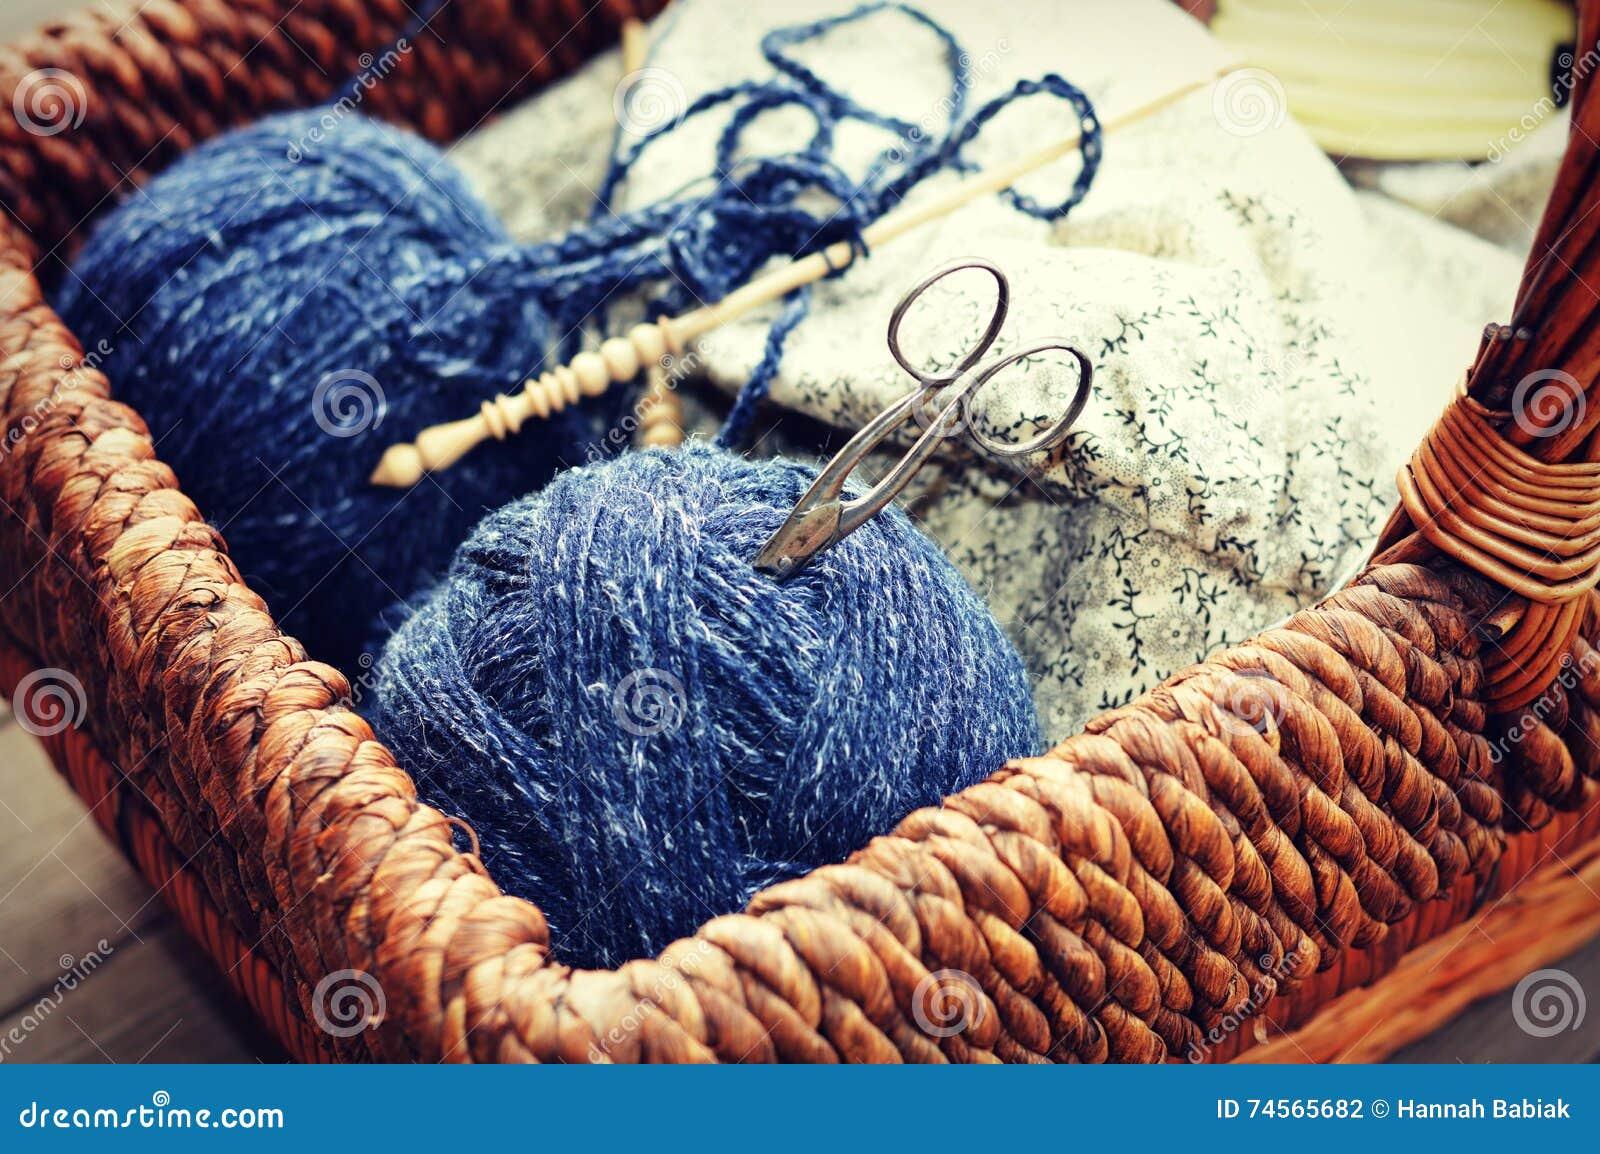 Knitting Materials : Knitting supplies stock photo image of crafts knit